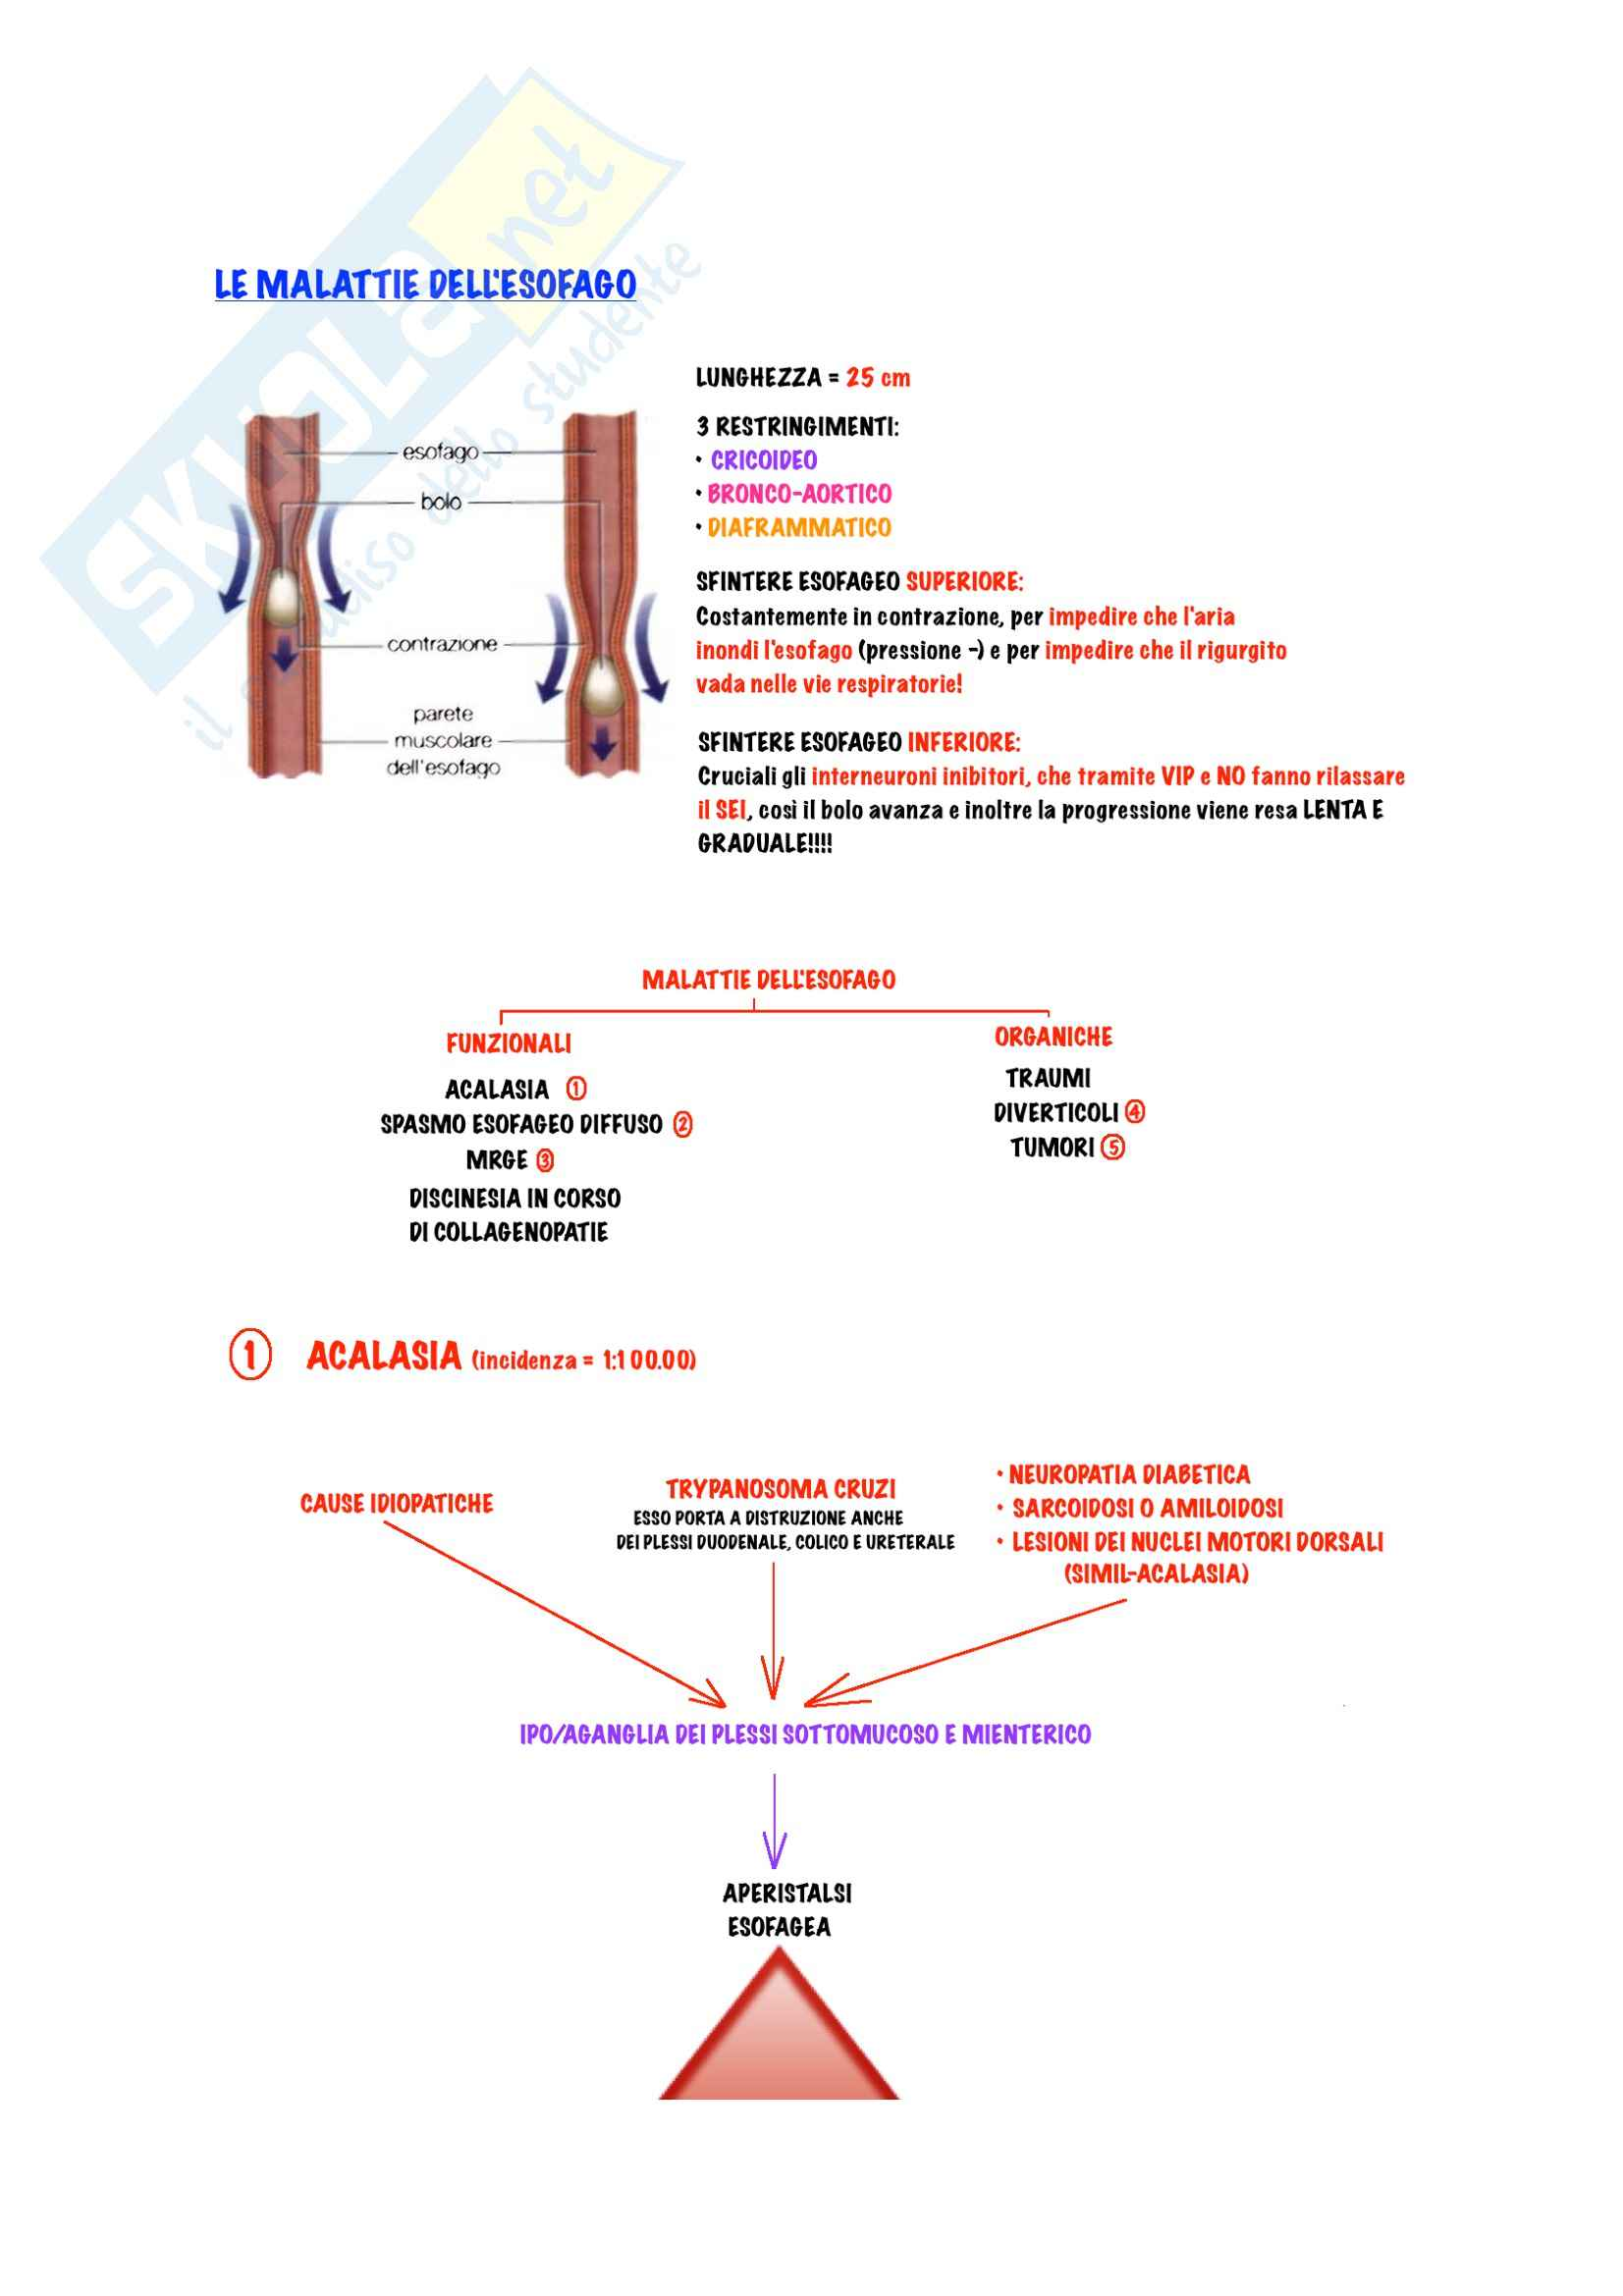 Gastroenterologia - Malattie dell'esofago Pag. 2